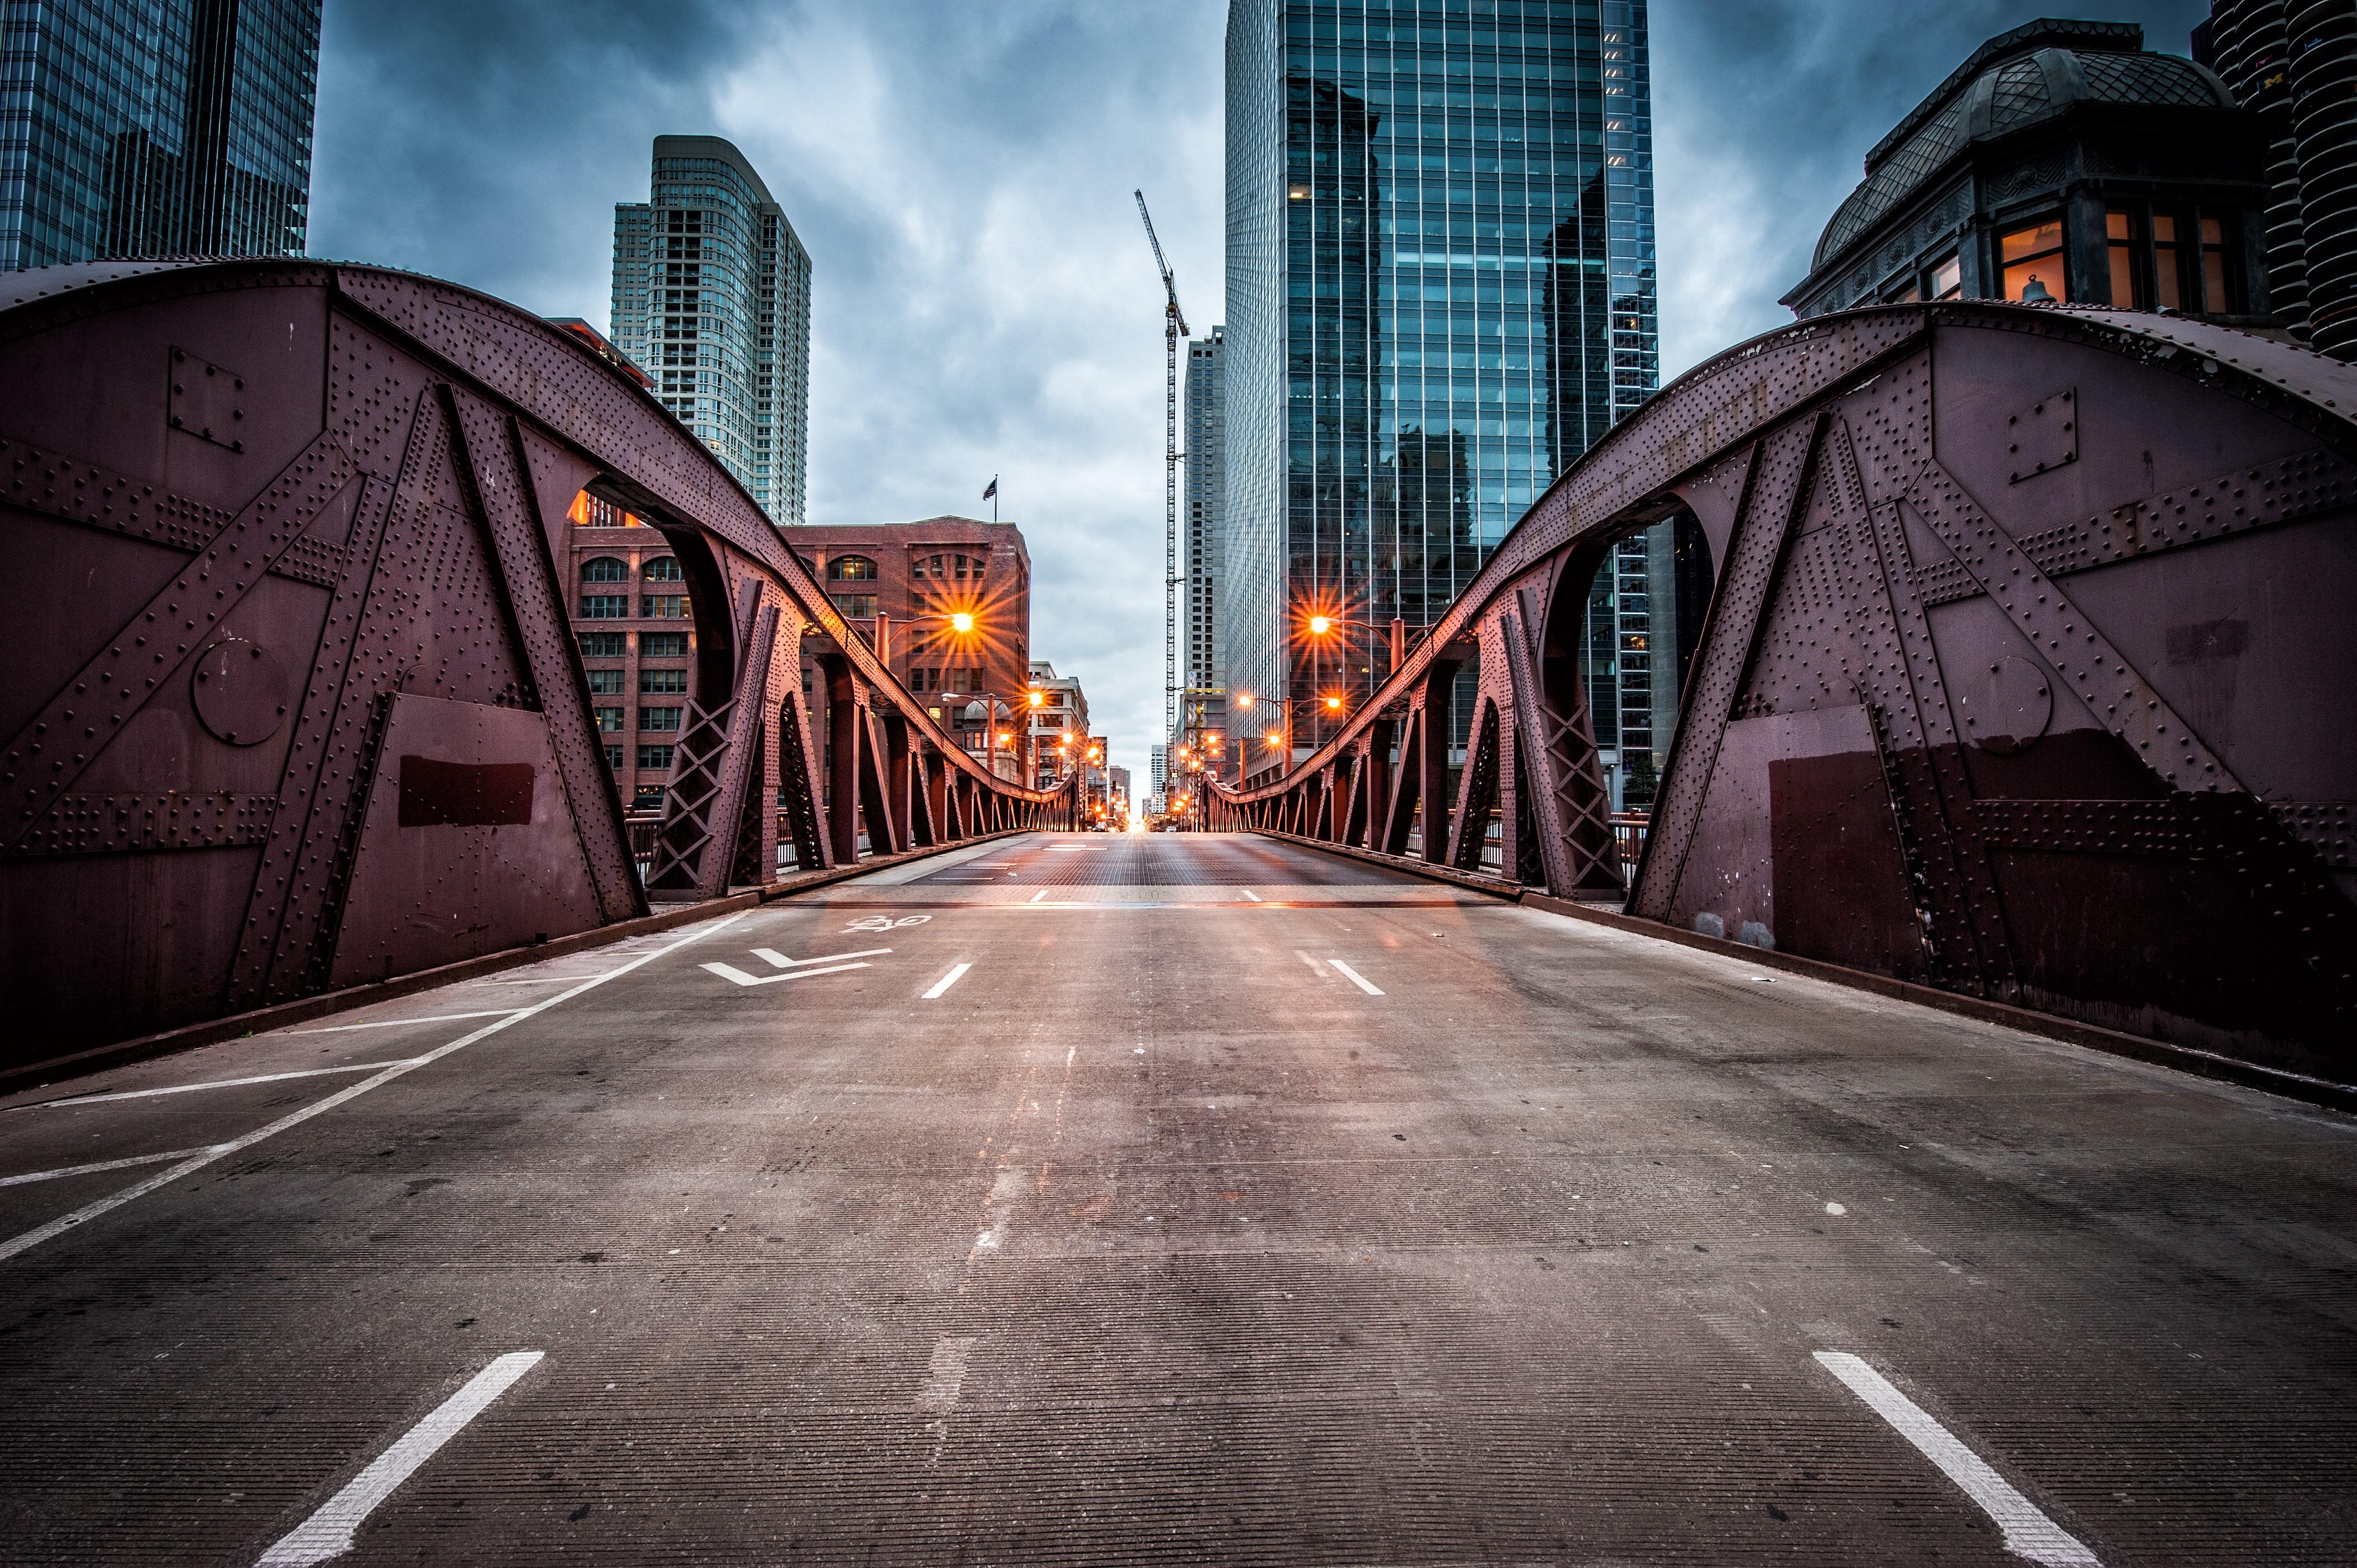 Niagara Falls Hd 1080p Wallpapers Wallpaper Clark Street Bridge Chicago Usa Travel